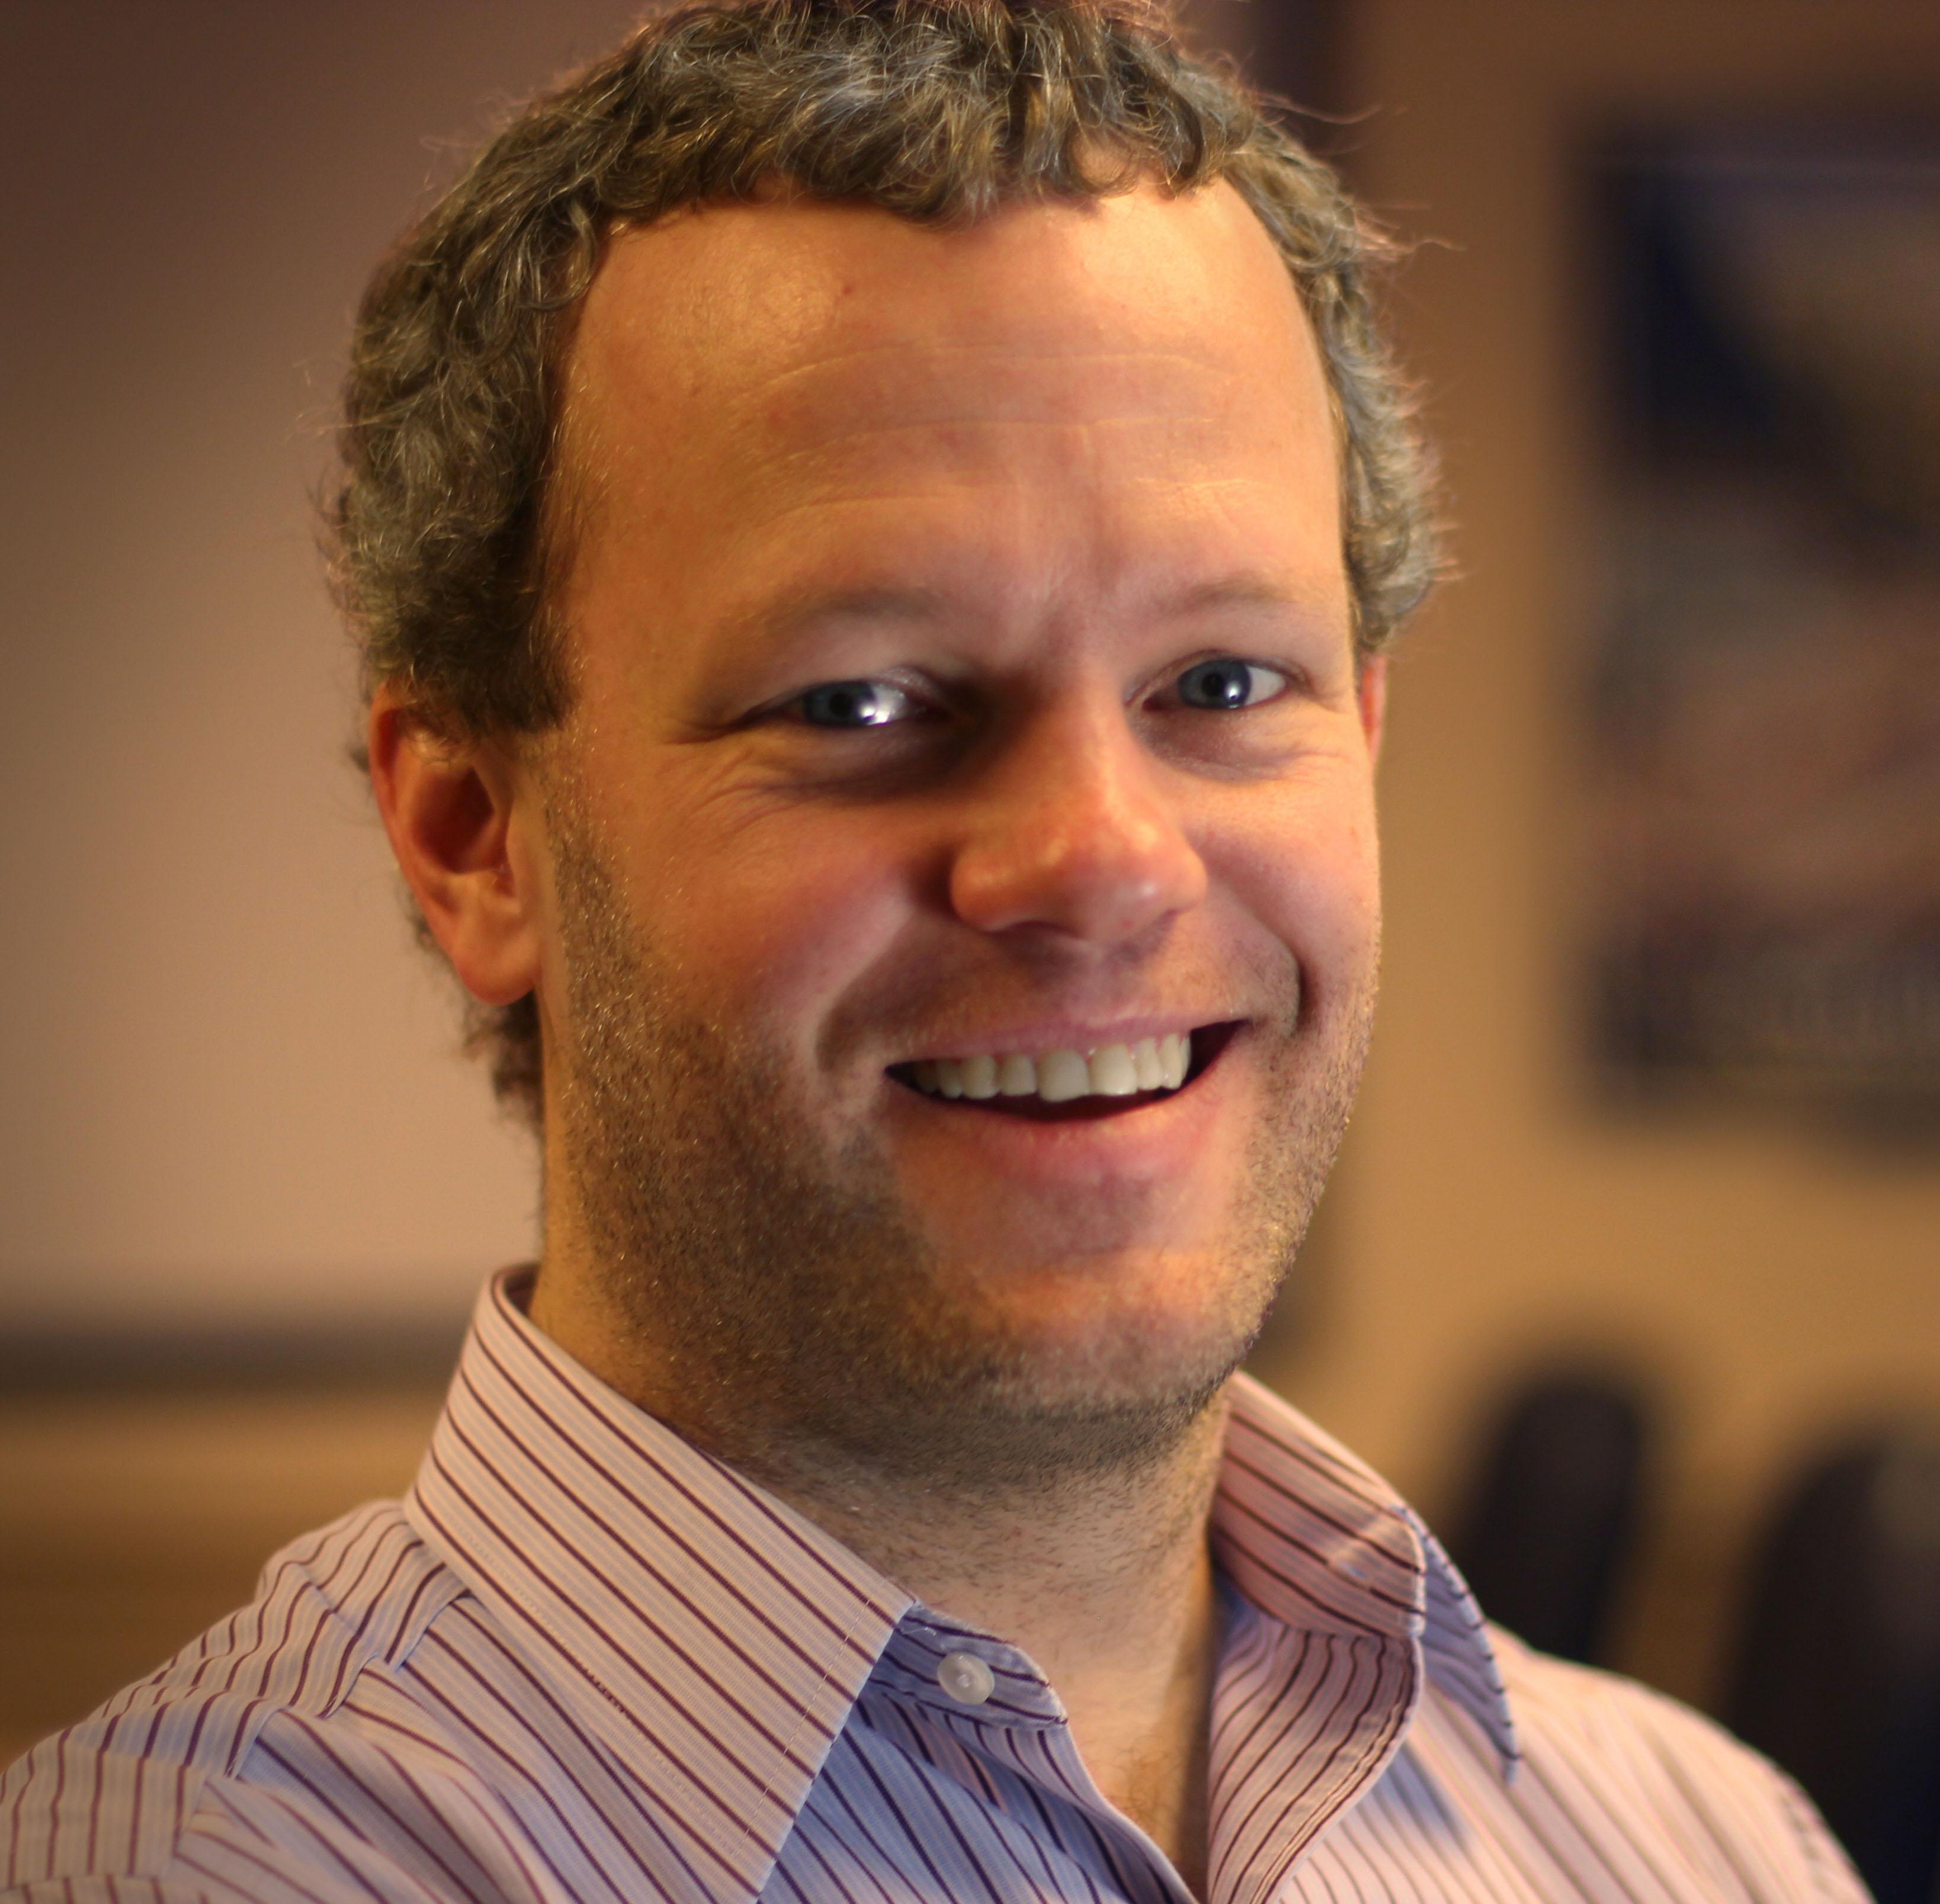 Gabriel Tompkins, IndustrySafe Vice President of Technology